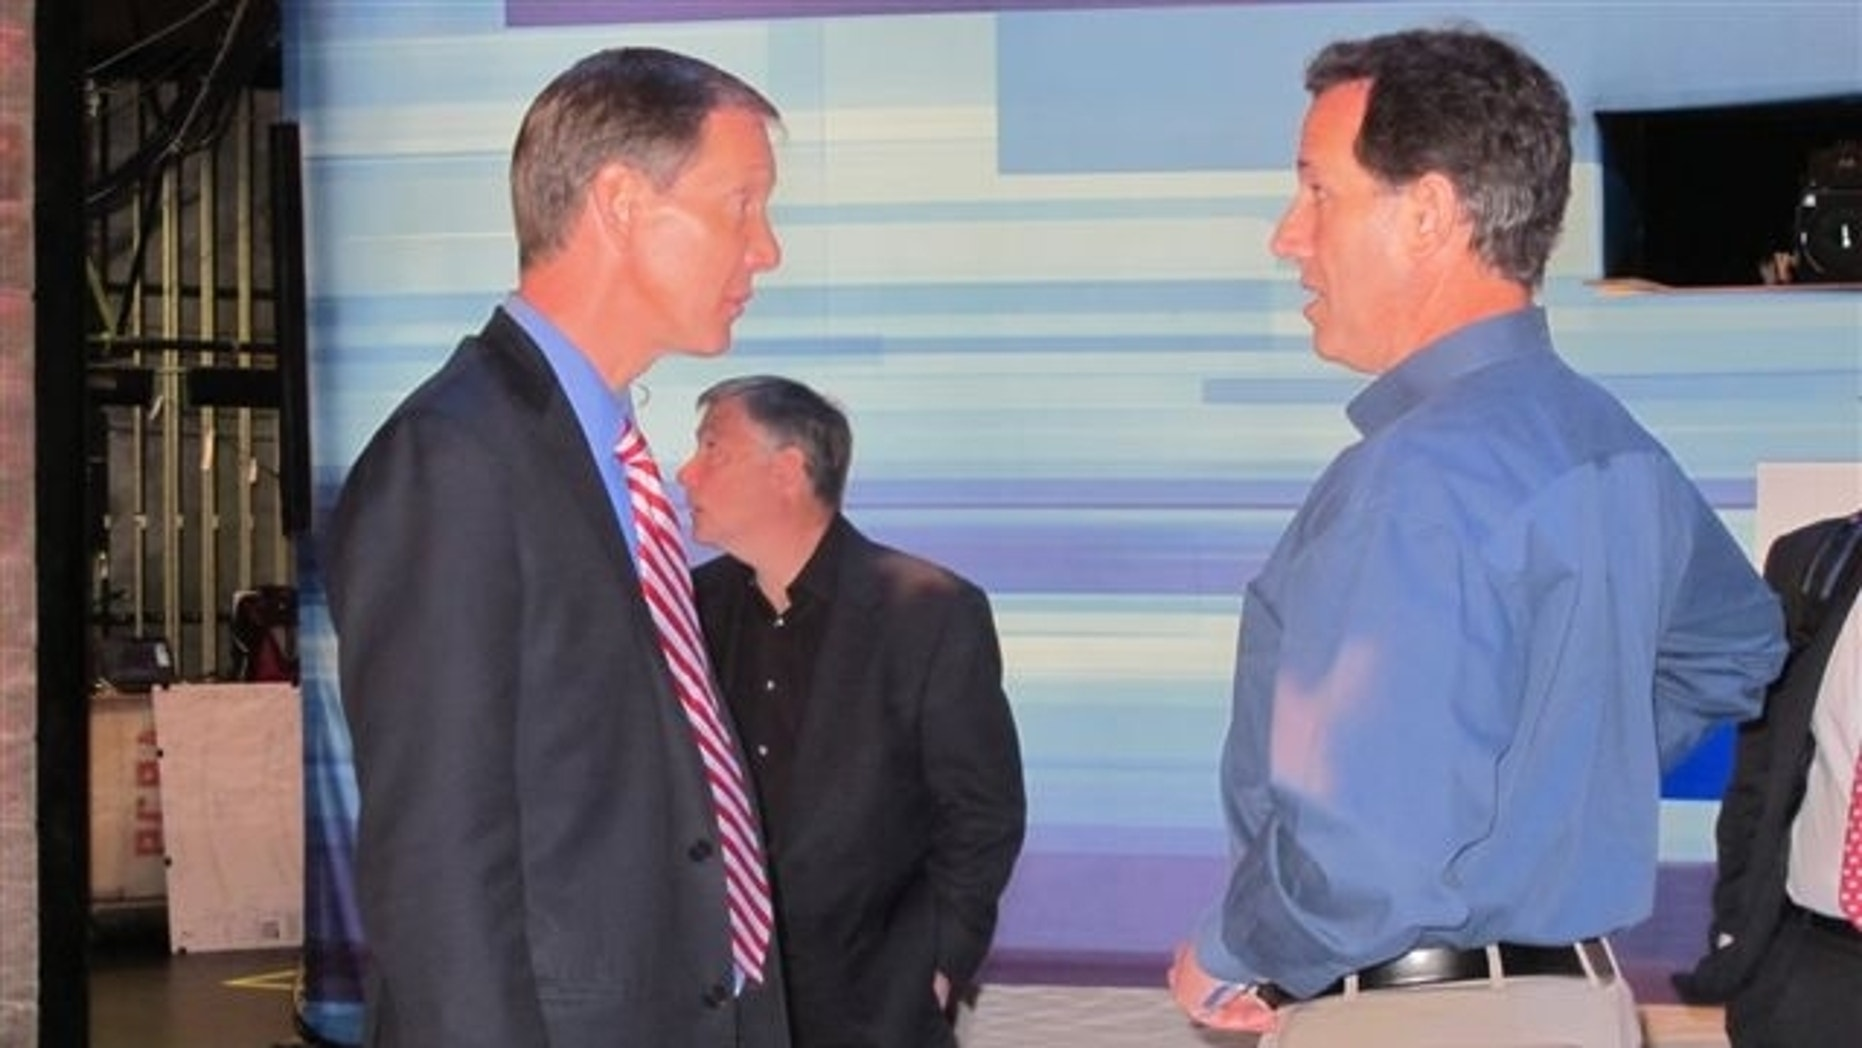 Fox News Chief Political Correspondent Carl Cameron talks with former Sen. Rick Santorum, R-Pa., on the stage of Thursday's GOP debate in Greenville, S.C.  (Fox News Photo / Katy Ricalde)